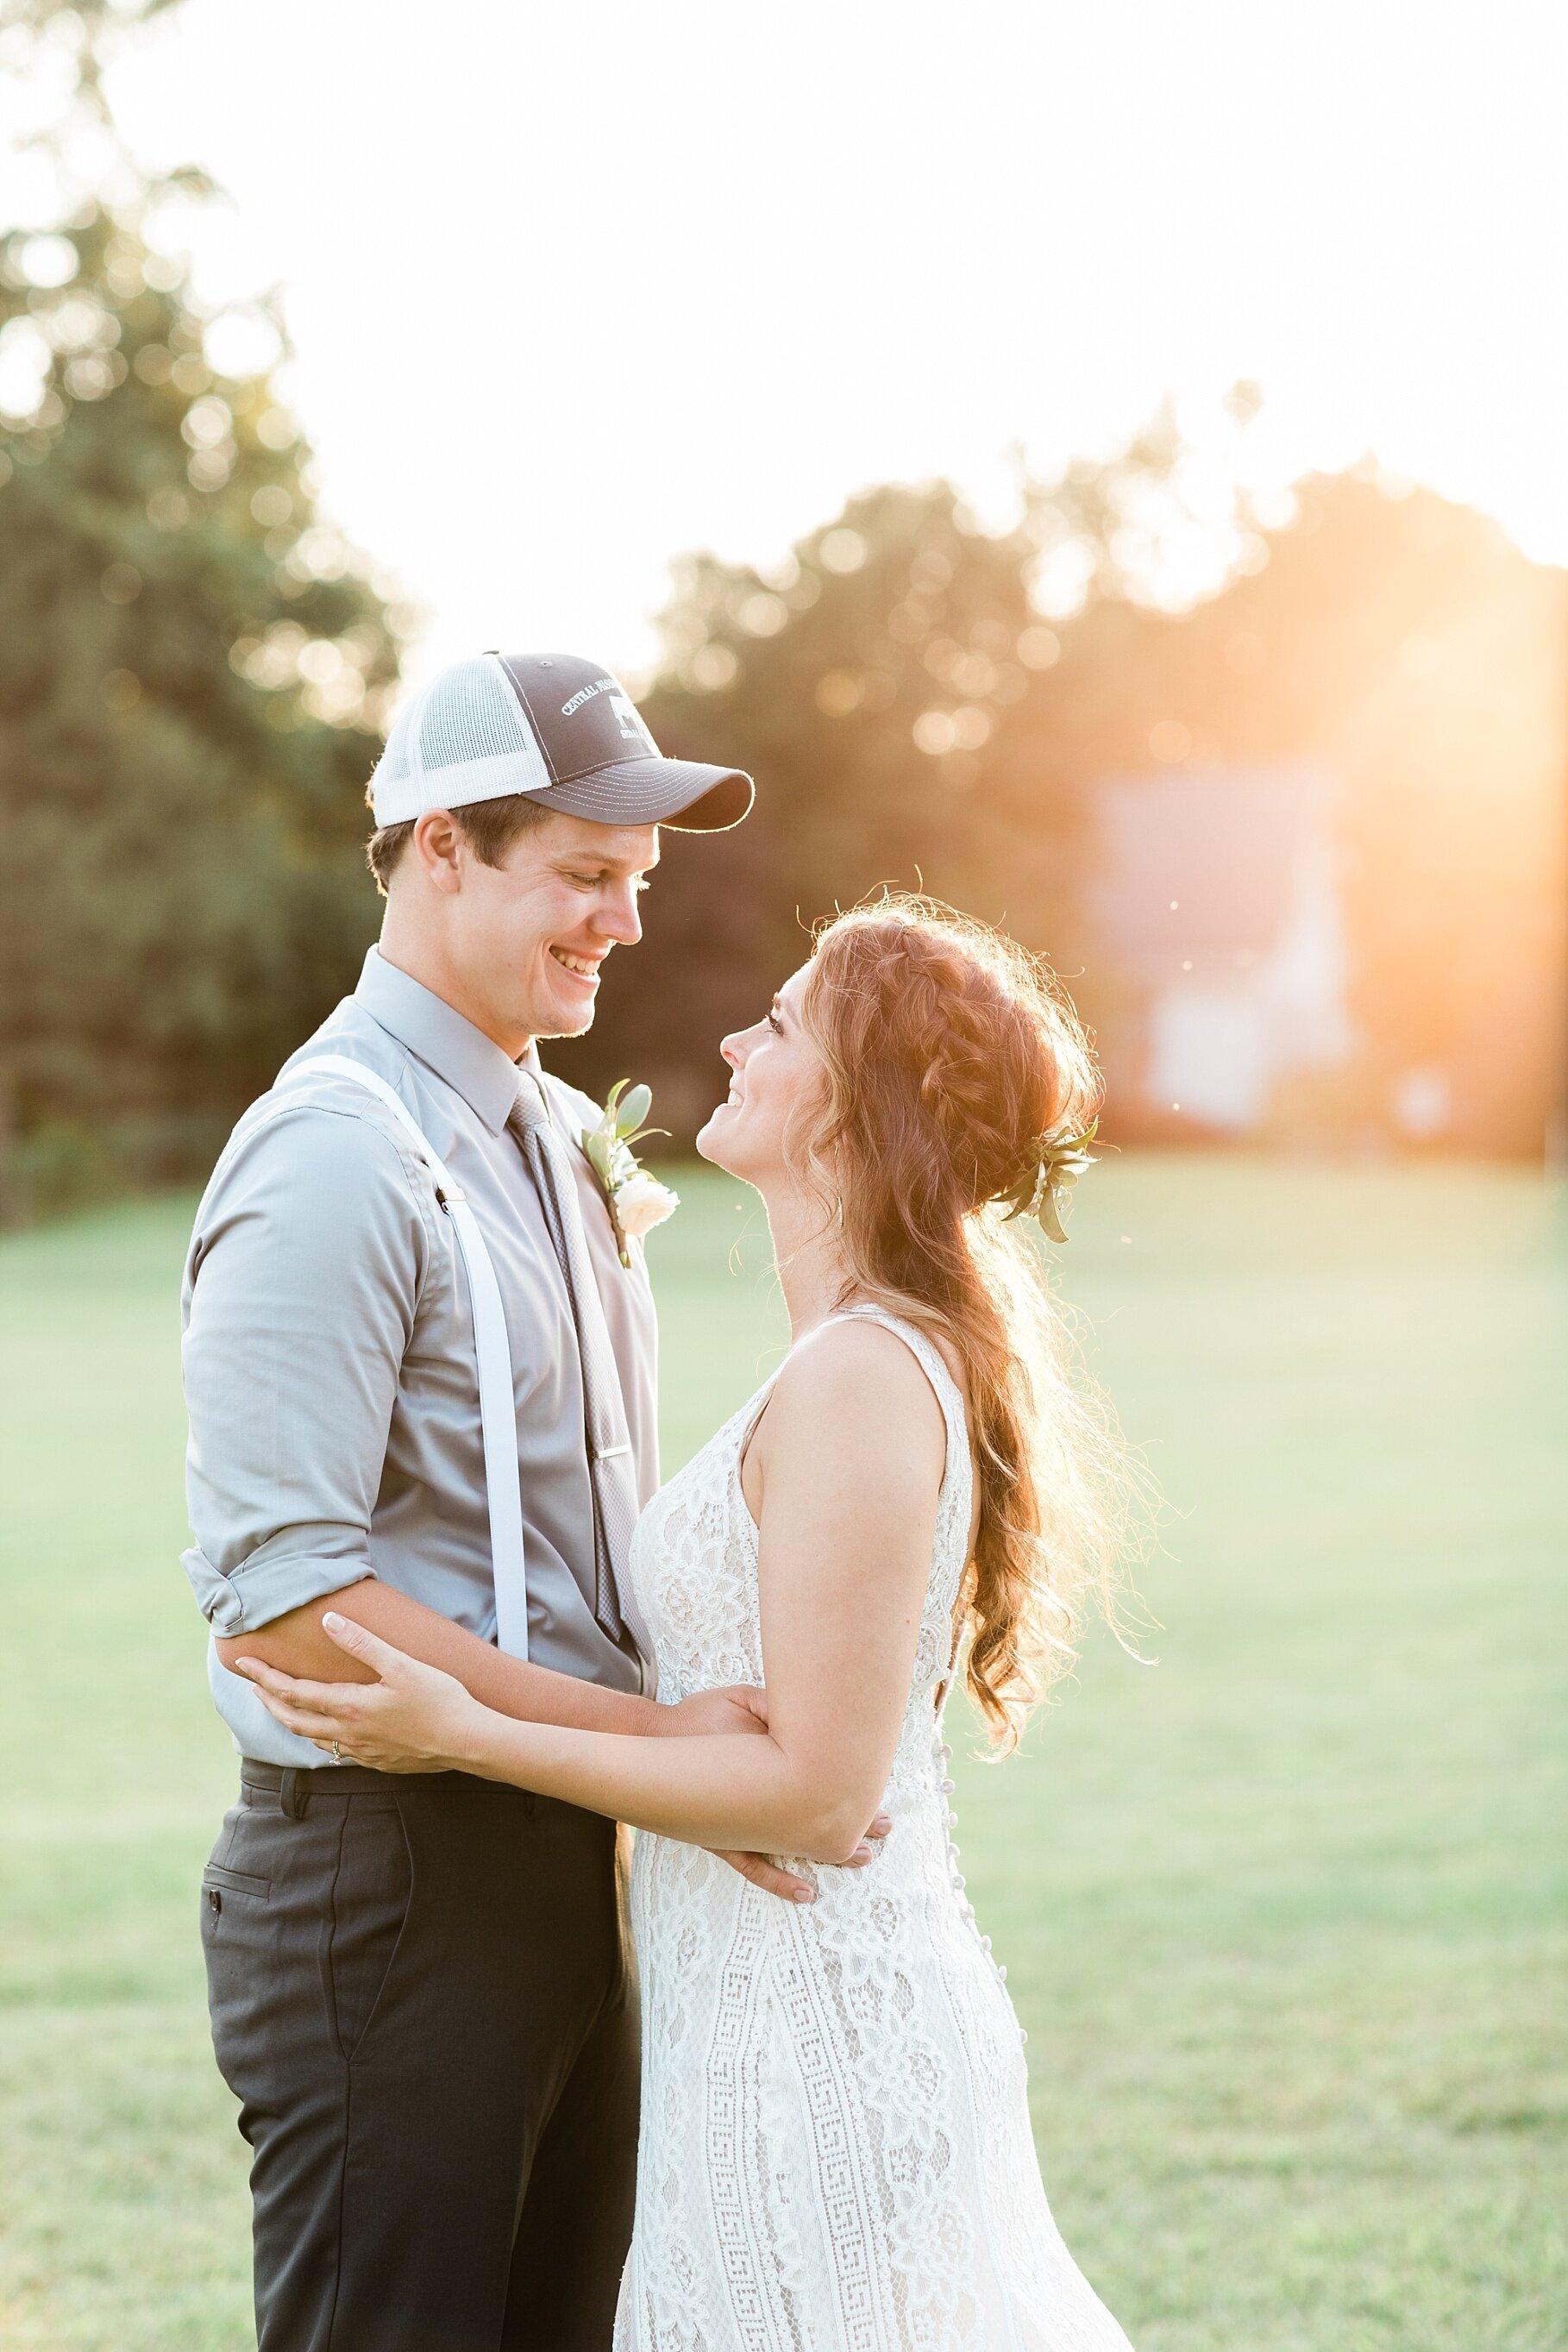 Earth-Toned Wedding by KKP Associate Wedding Photographer and Kelsi Kliethermes Photography Best Columbia Missouri Wedding Photographer_0039.jpg